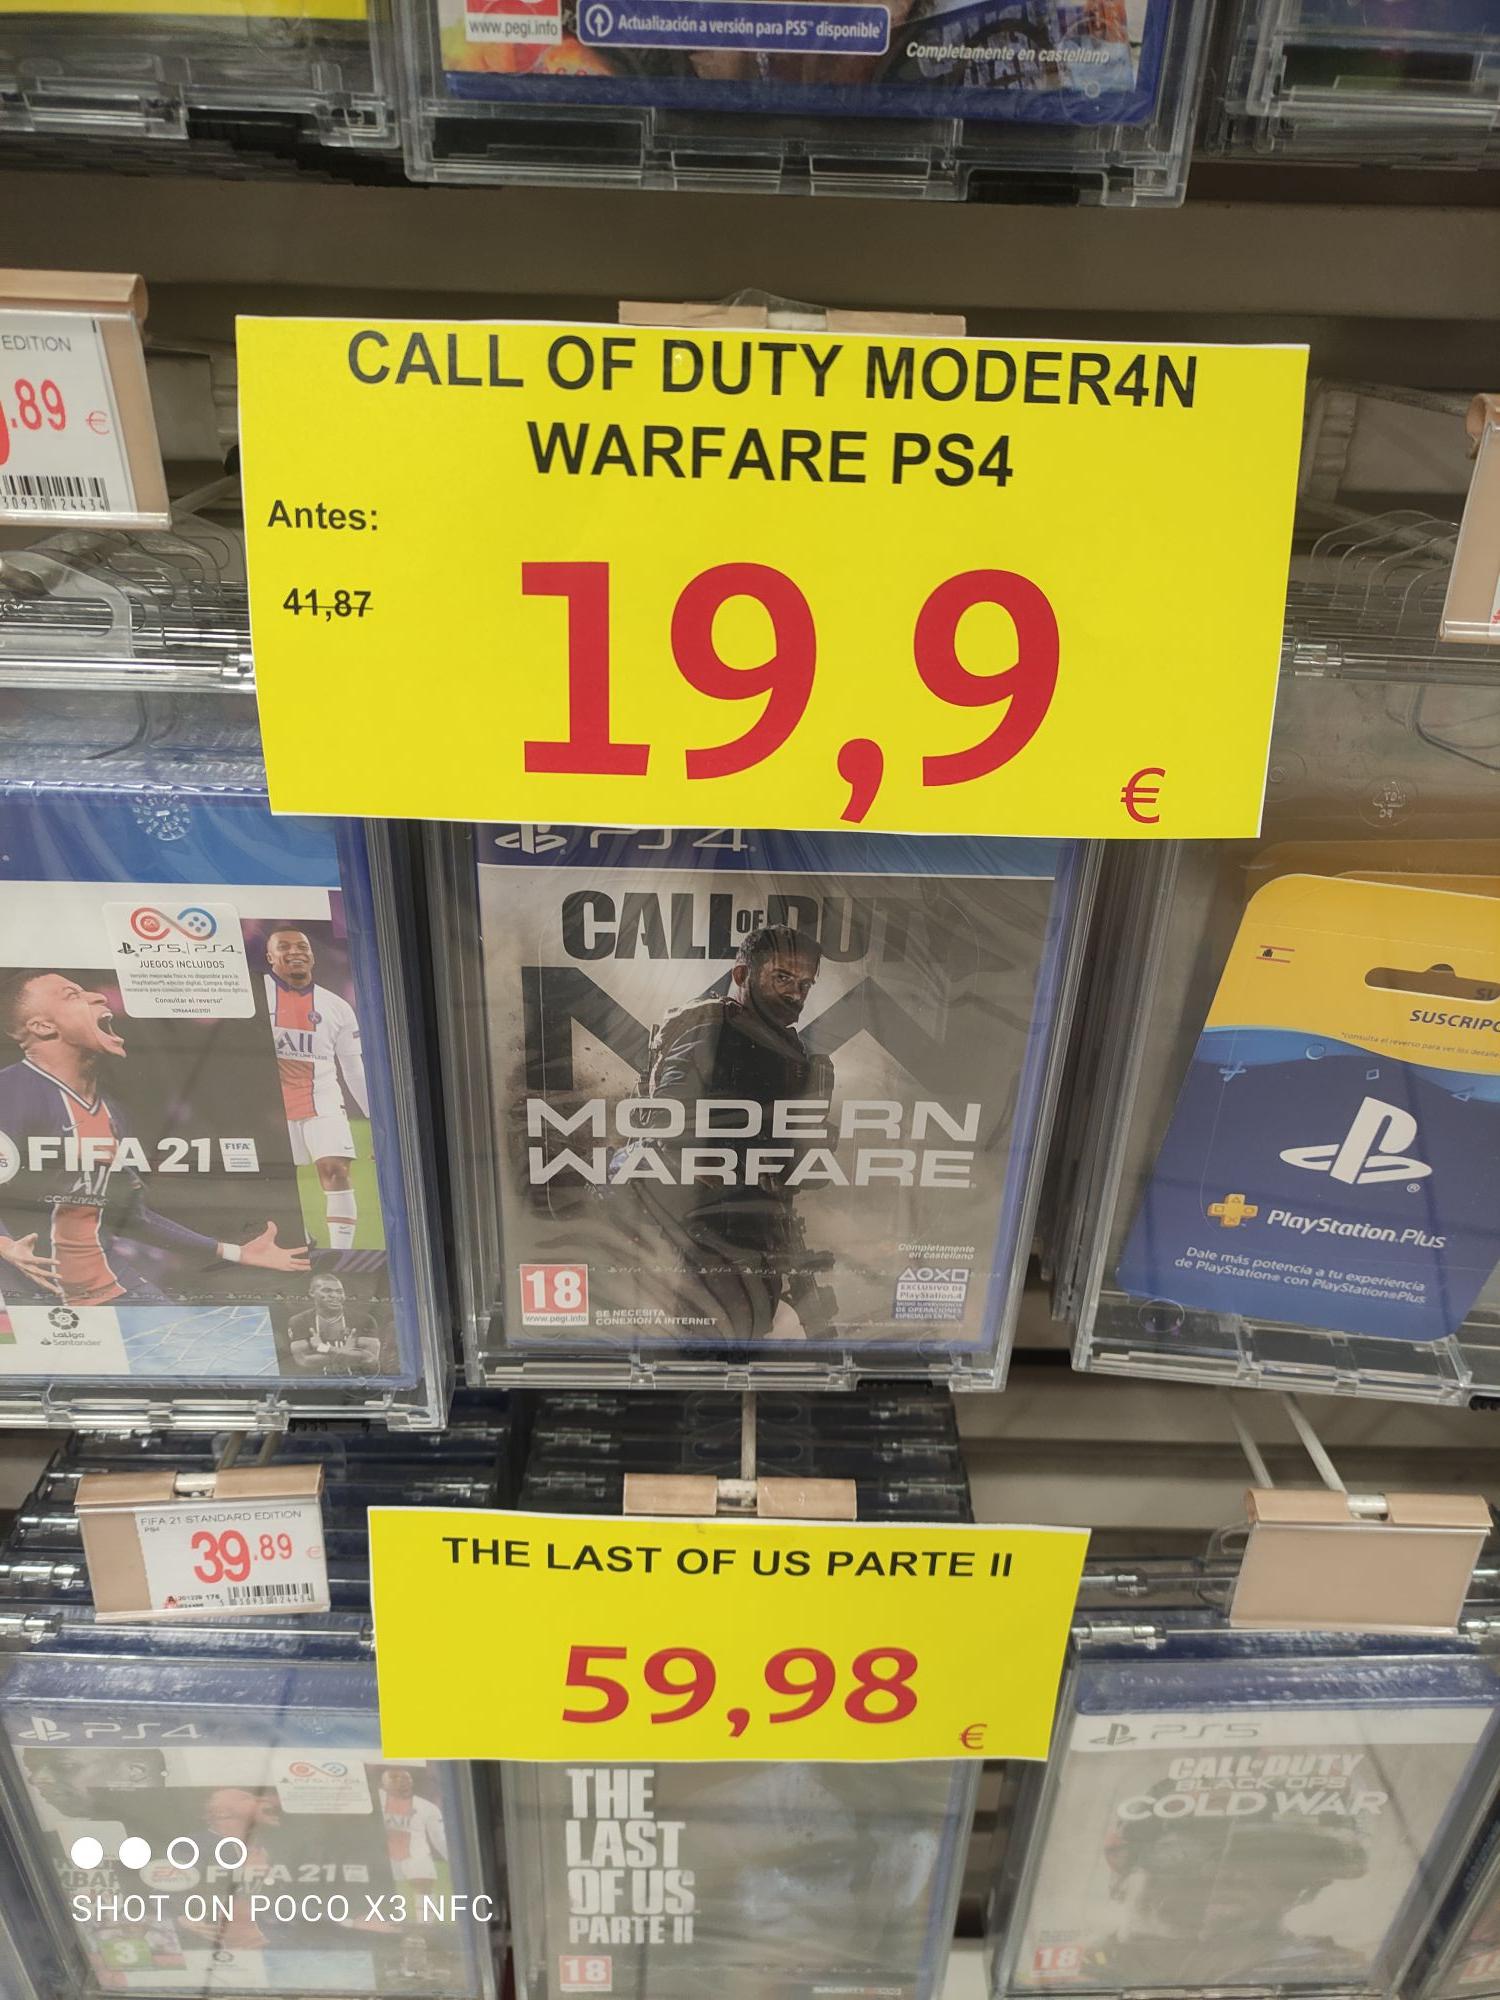 Call of duty modern warfare PS4 Alcampo de santiago de compostela